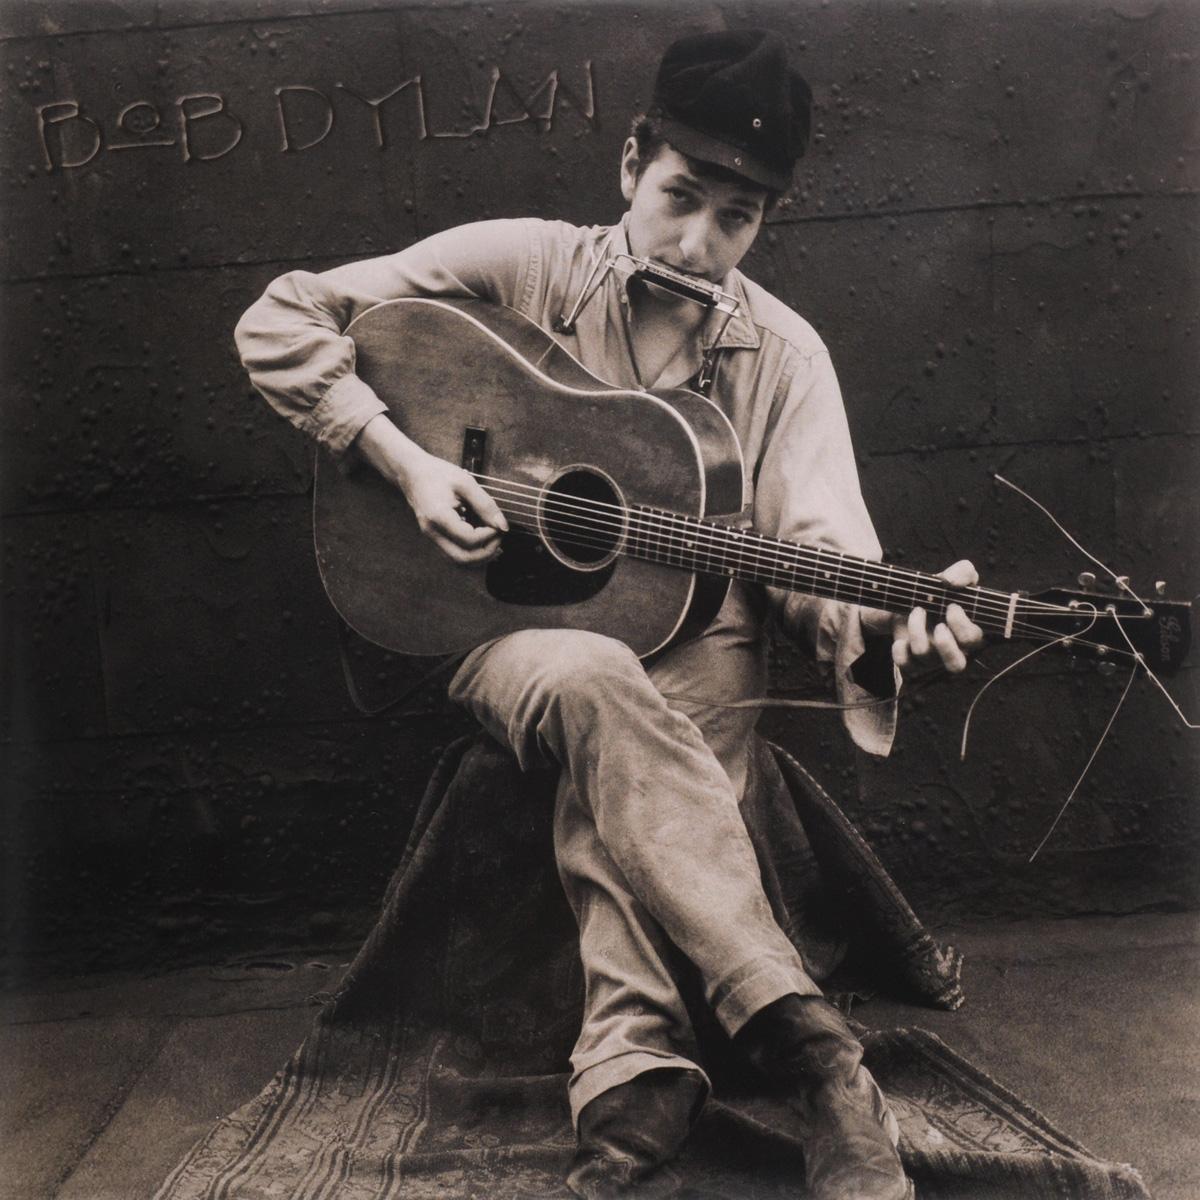 Боб Дилан Bob Dylan. First Album. Special Limited Edition (2 LP) кендрик ламар kendrick lamar damn 2 lp